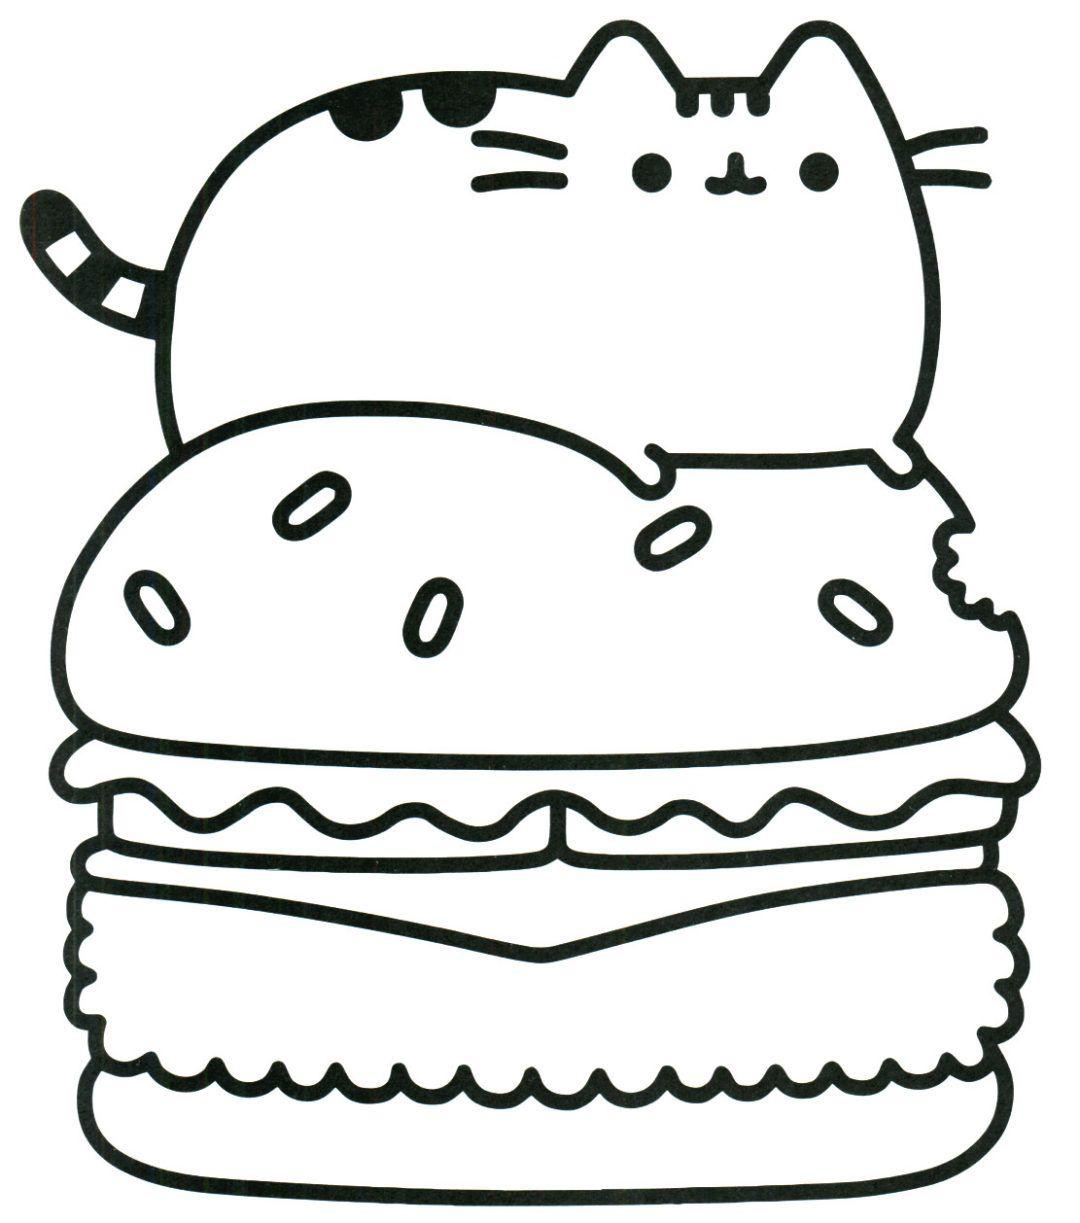 Pusheen burger coloring page